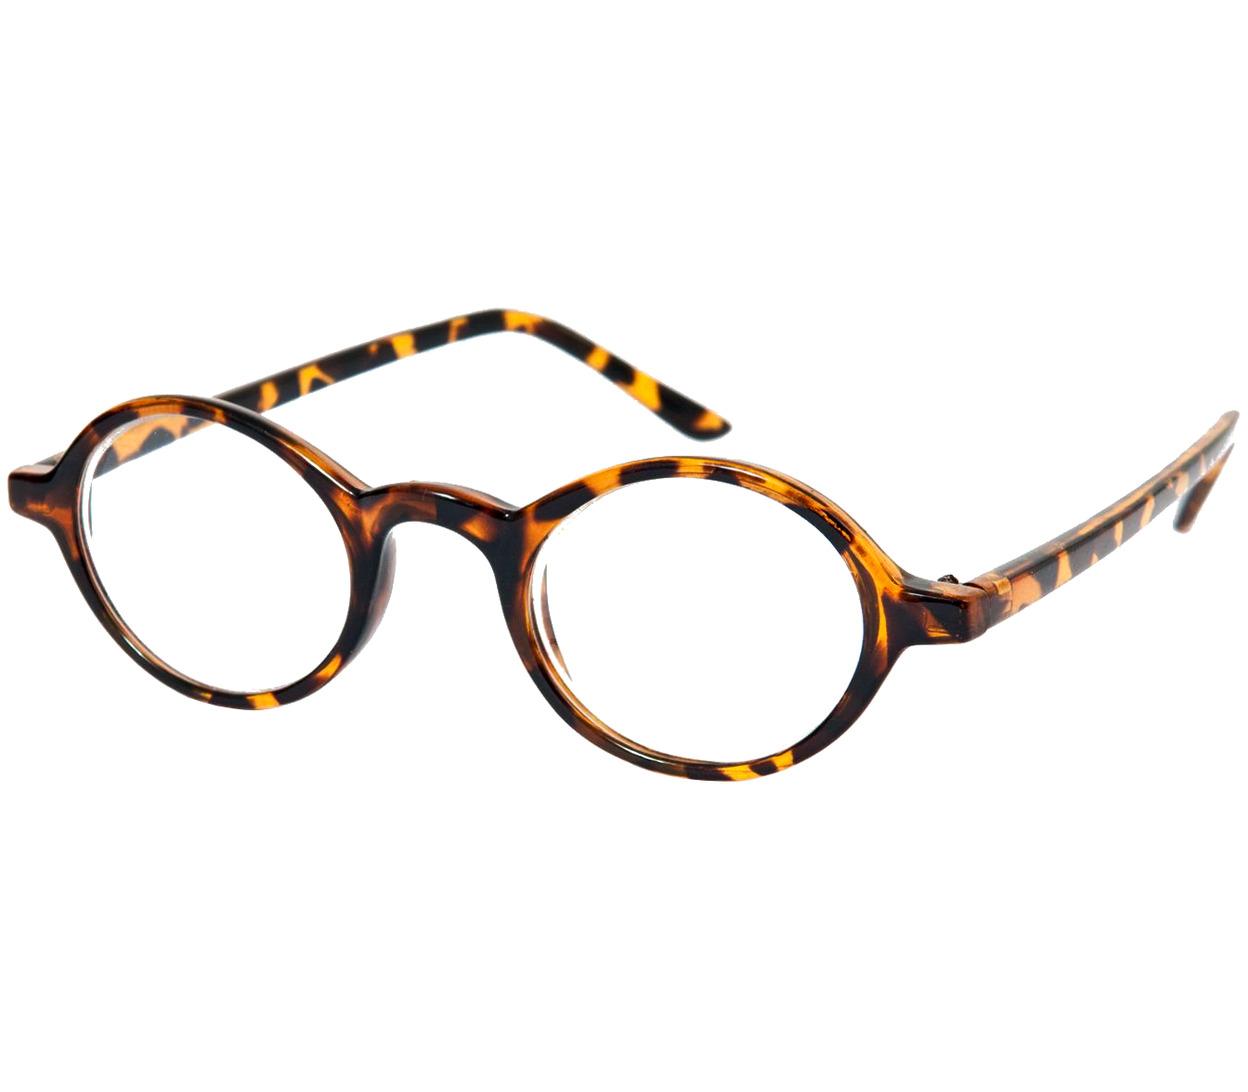 91d811e667a Buy tortoiseshell reading glasses. Shop every store on the internet ...